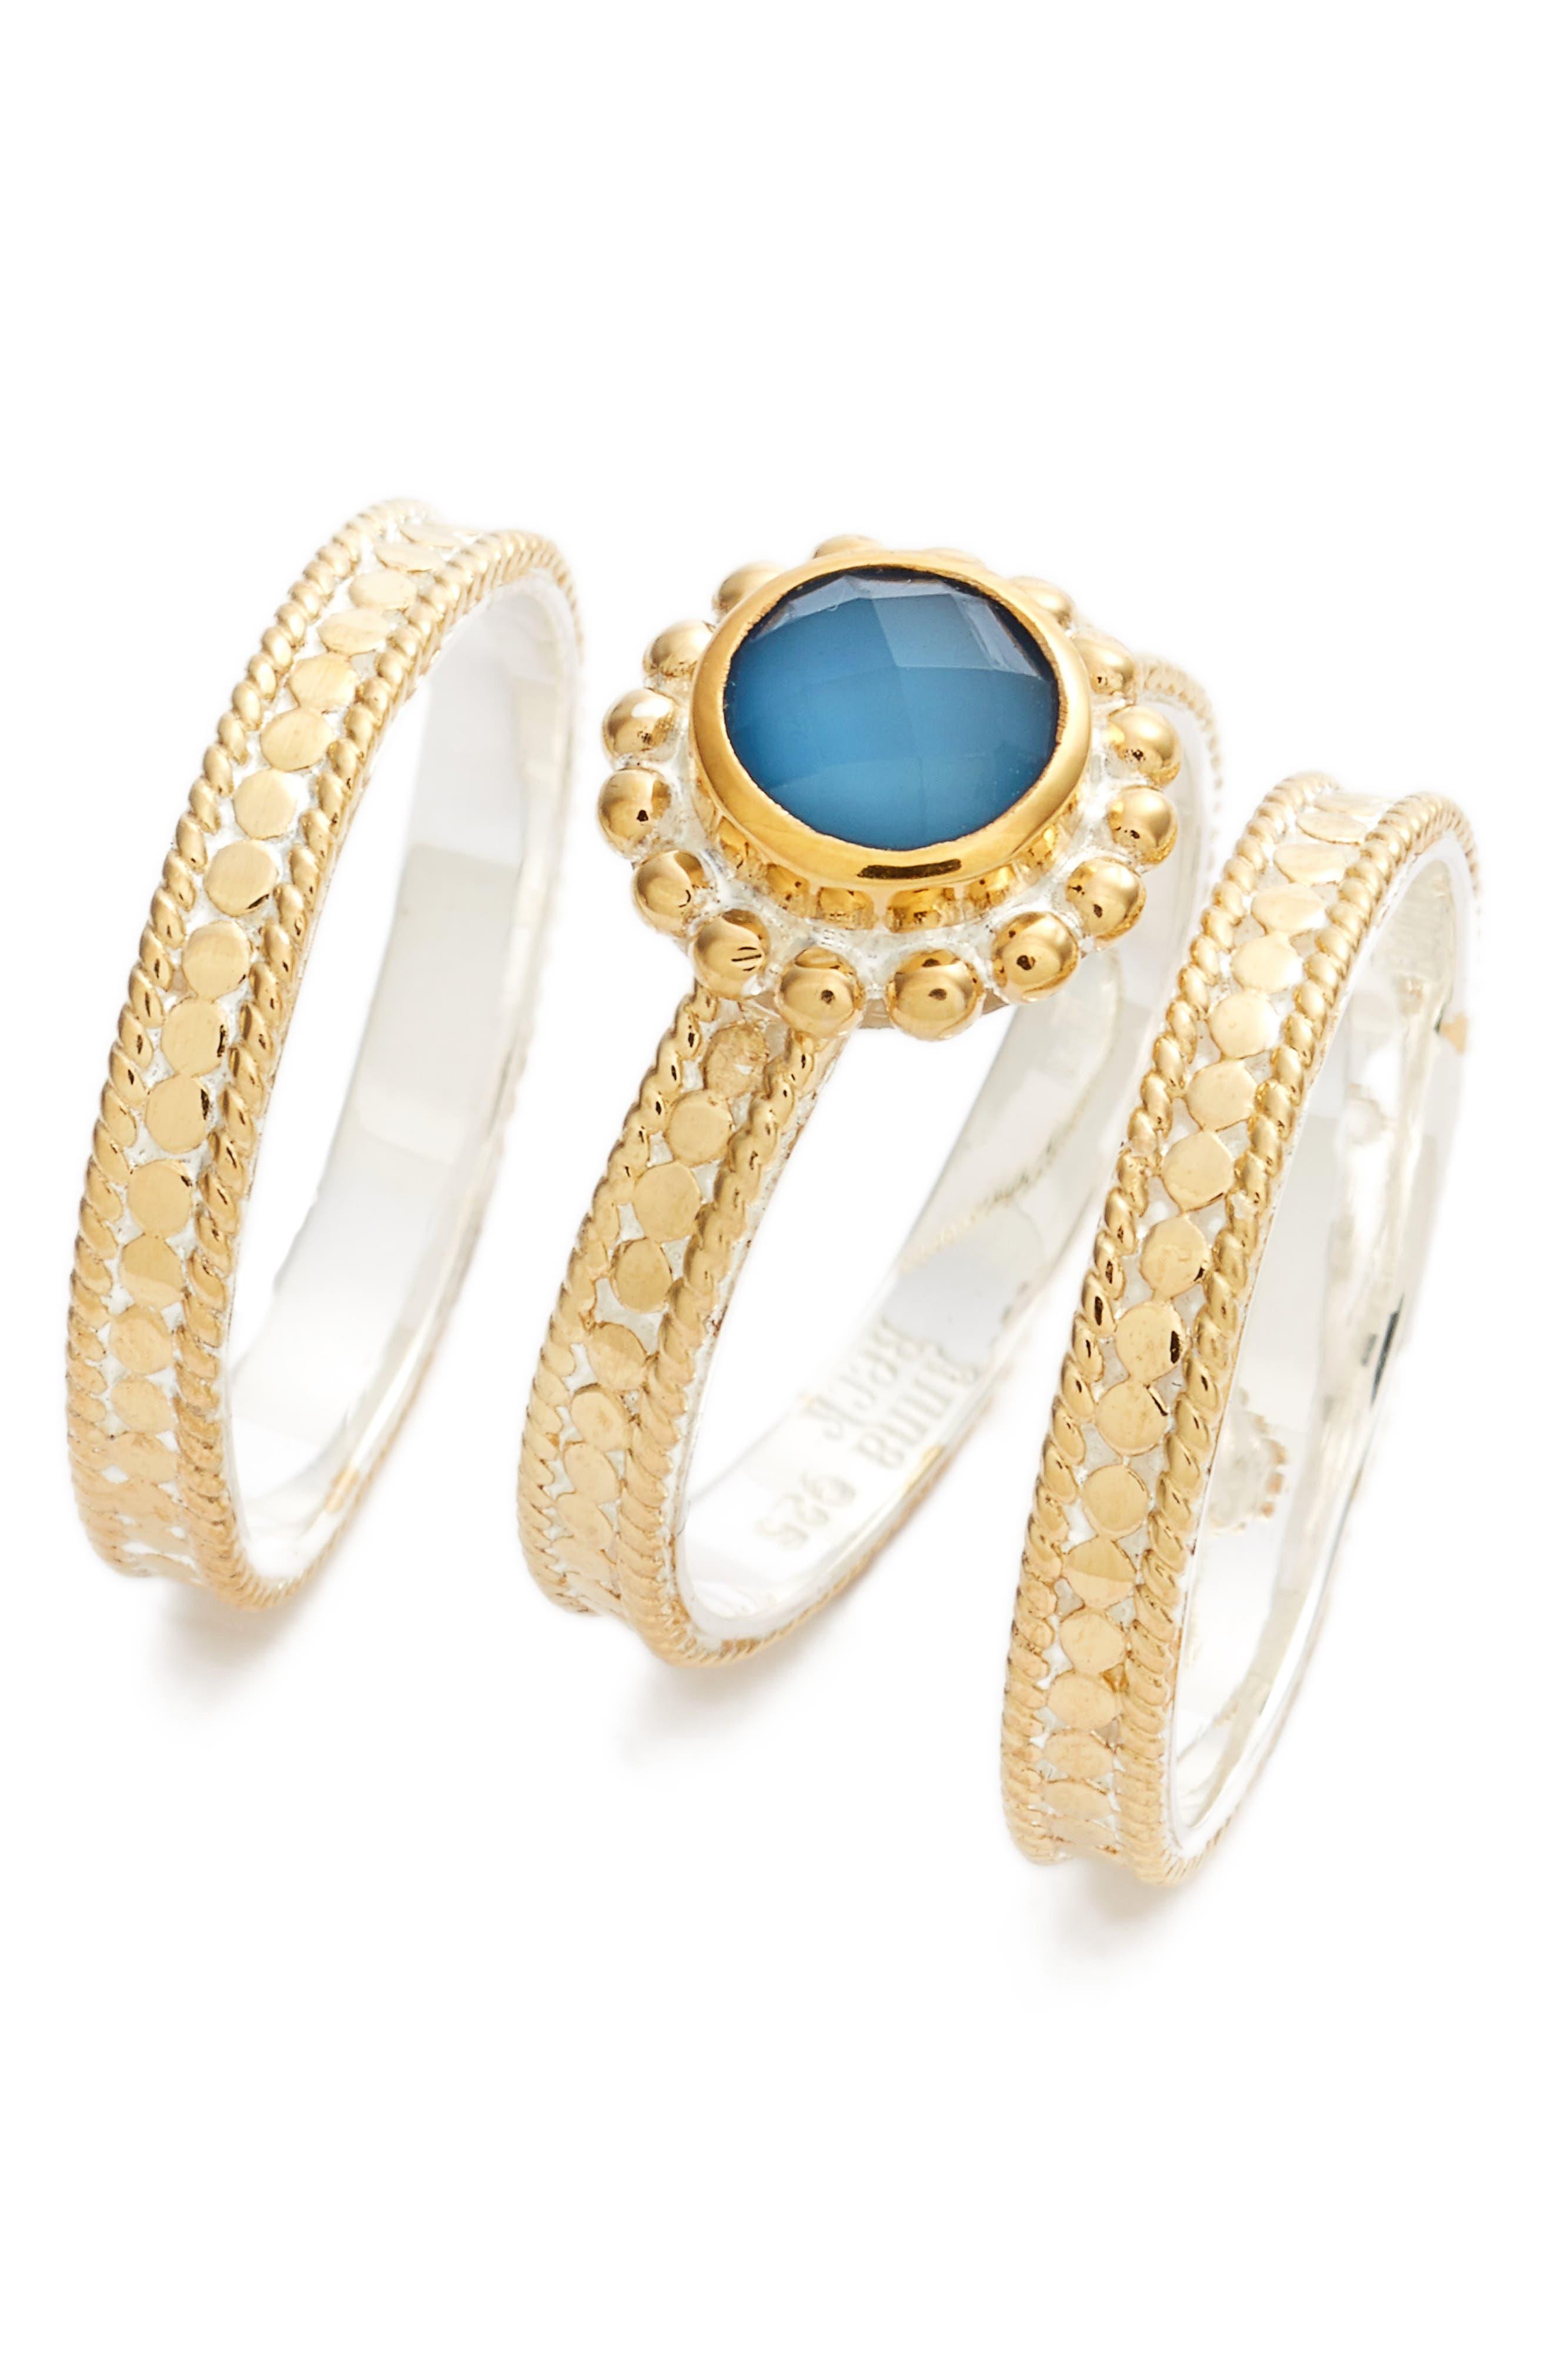 Blue Quartz Set of 3 Stack Rings,                         Main,                         color, Gold/ Blue Quartz